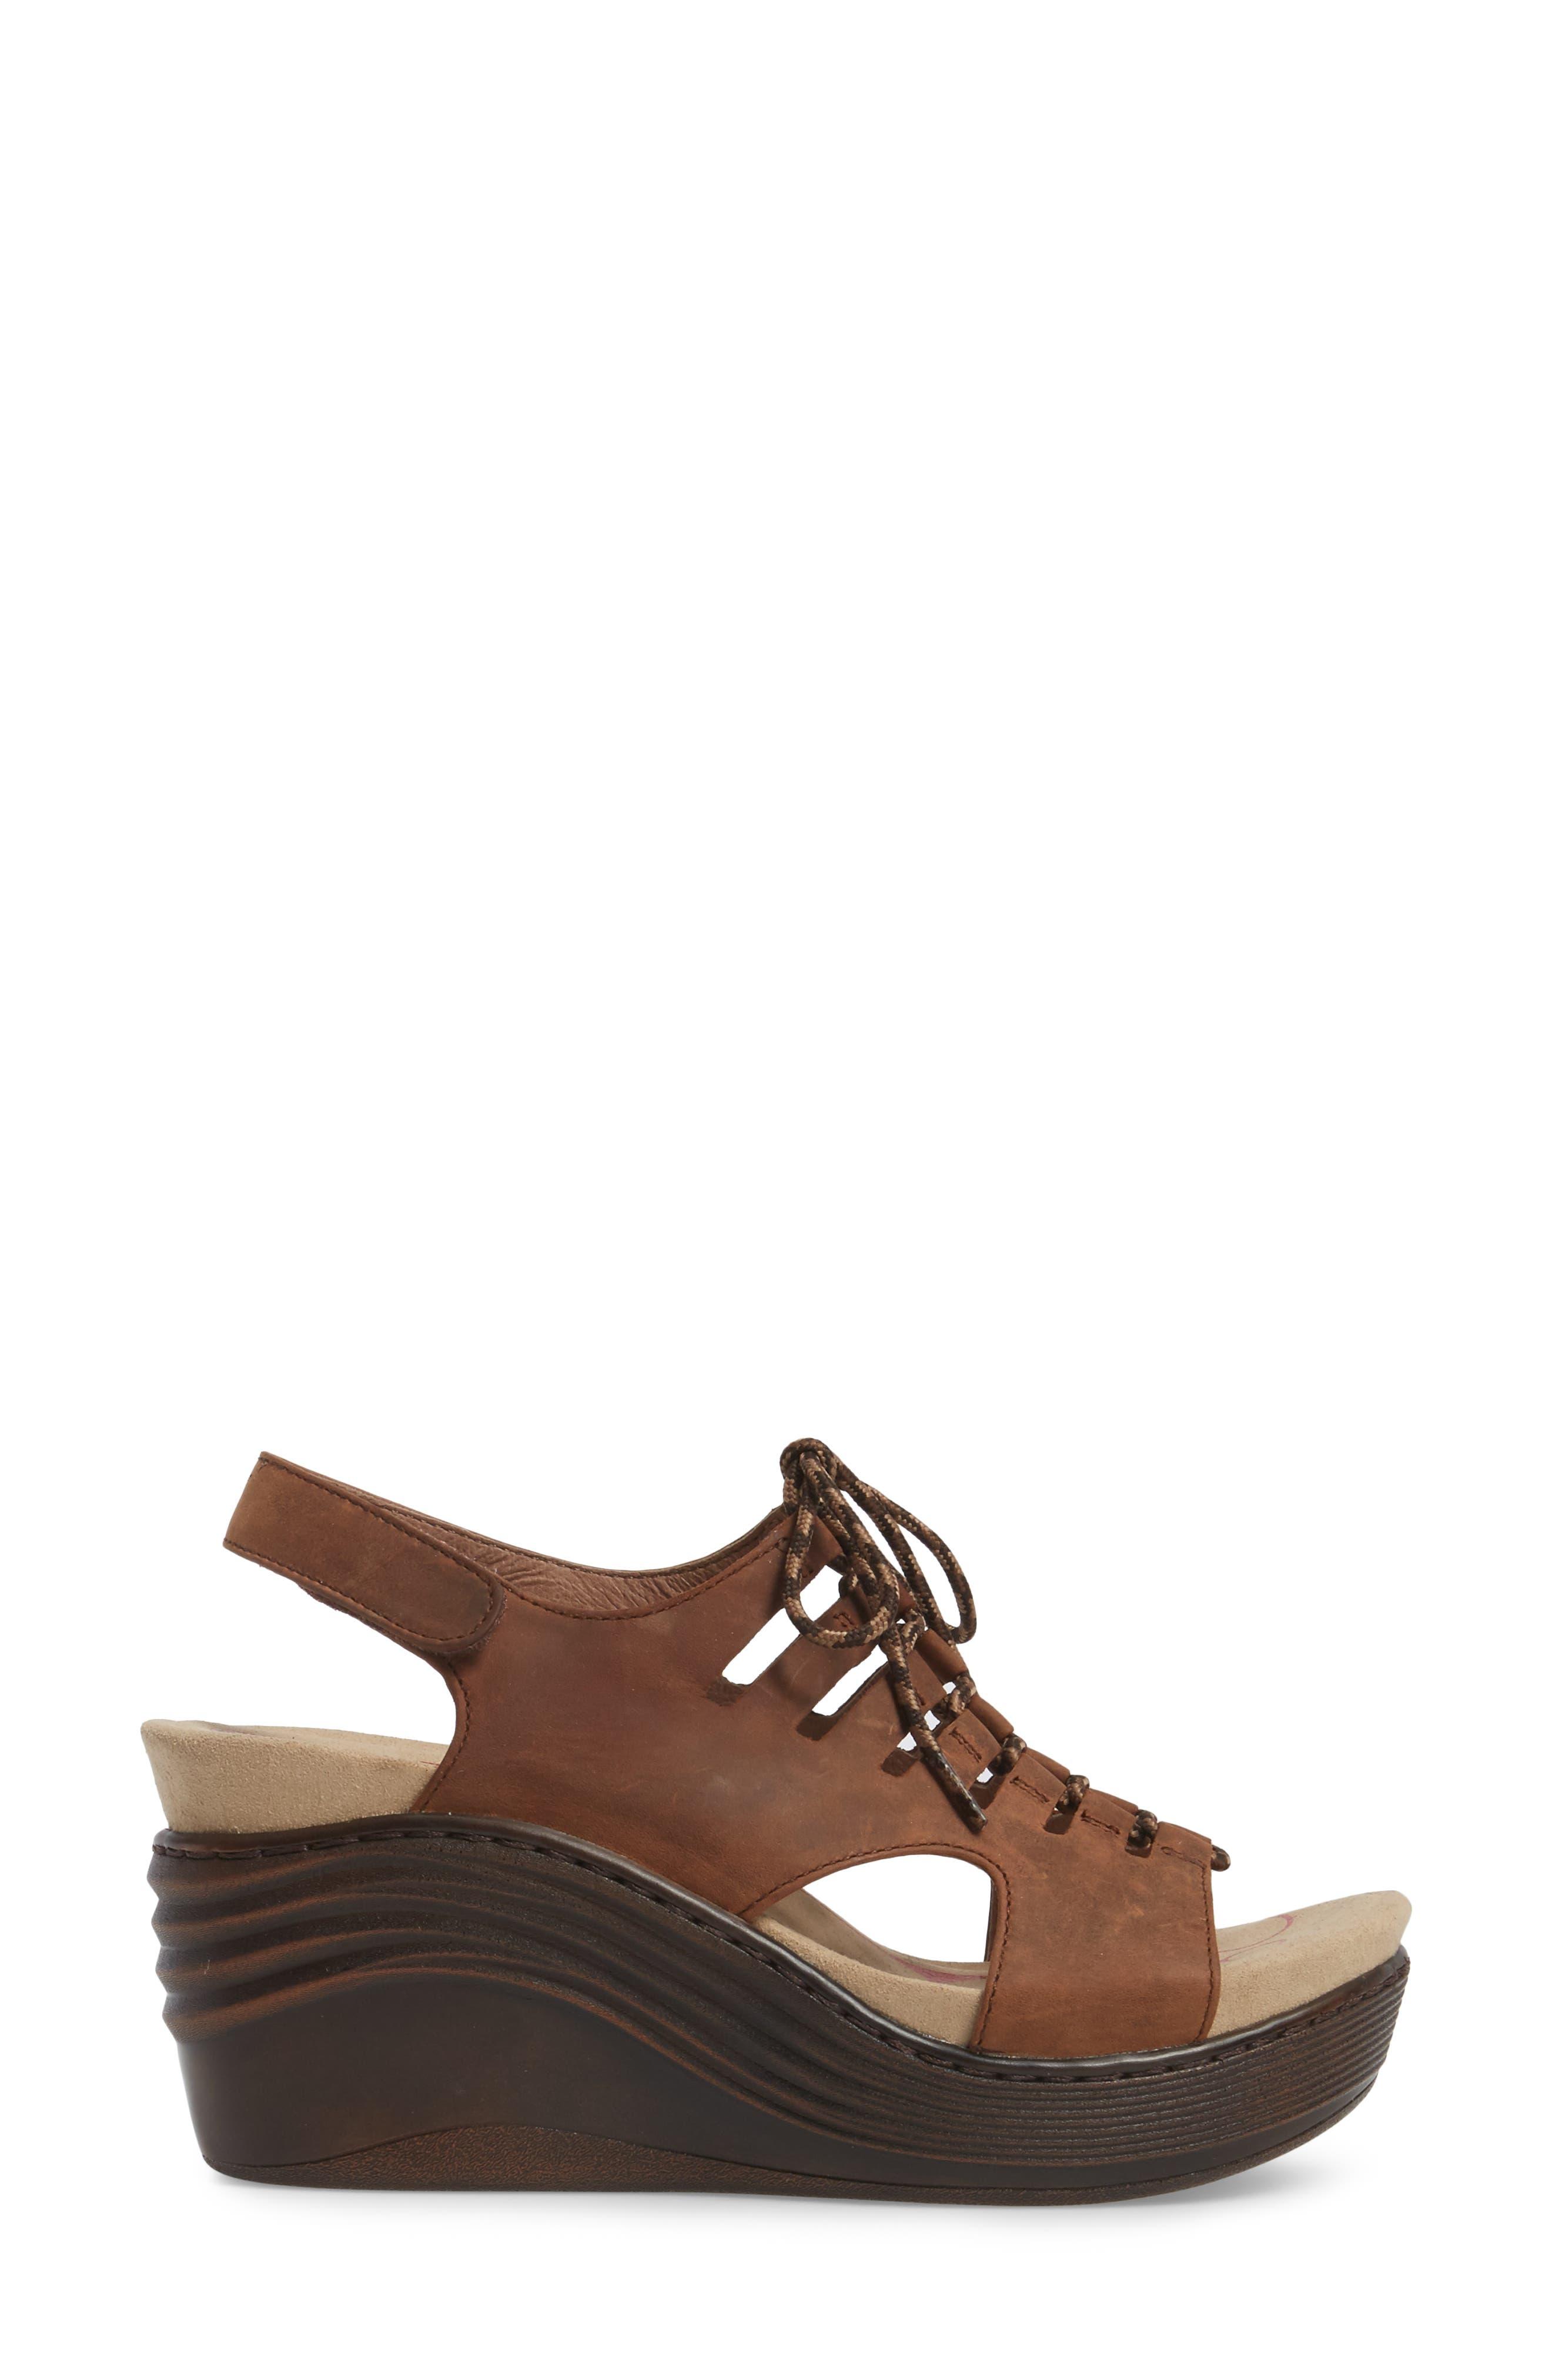 Sirus Wedge Sandal,                             Alternate thumbnail 3, color,                             Aztec Brown Leather